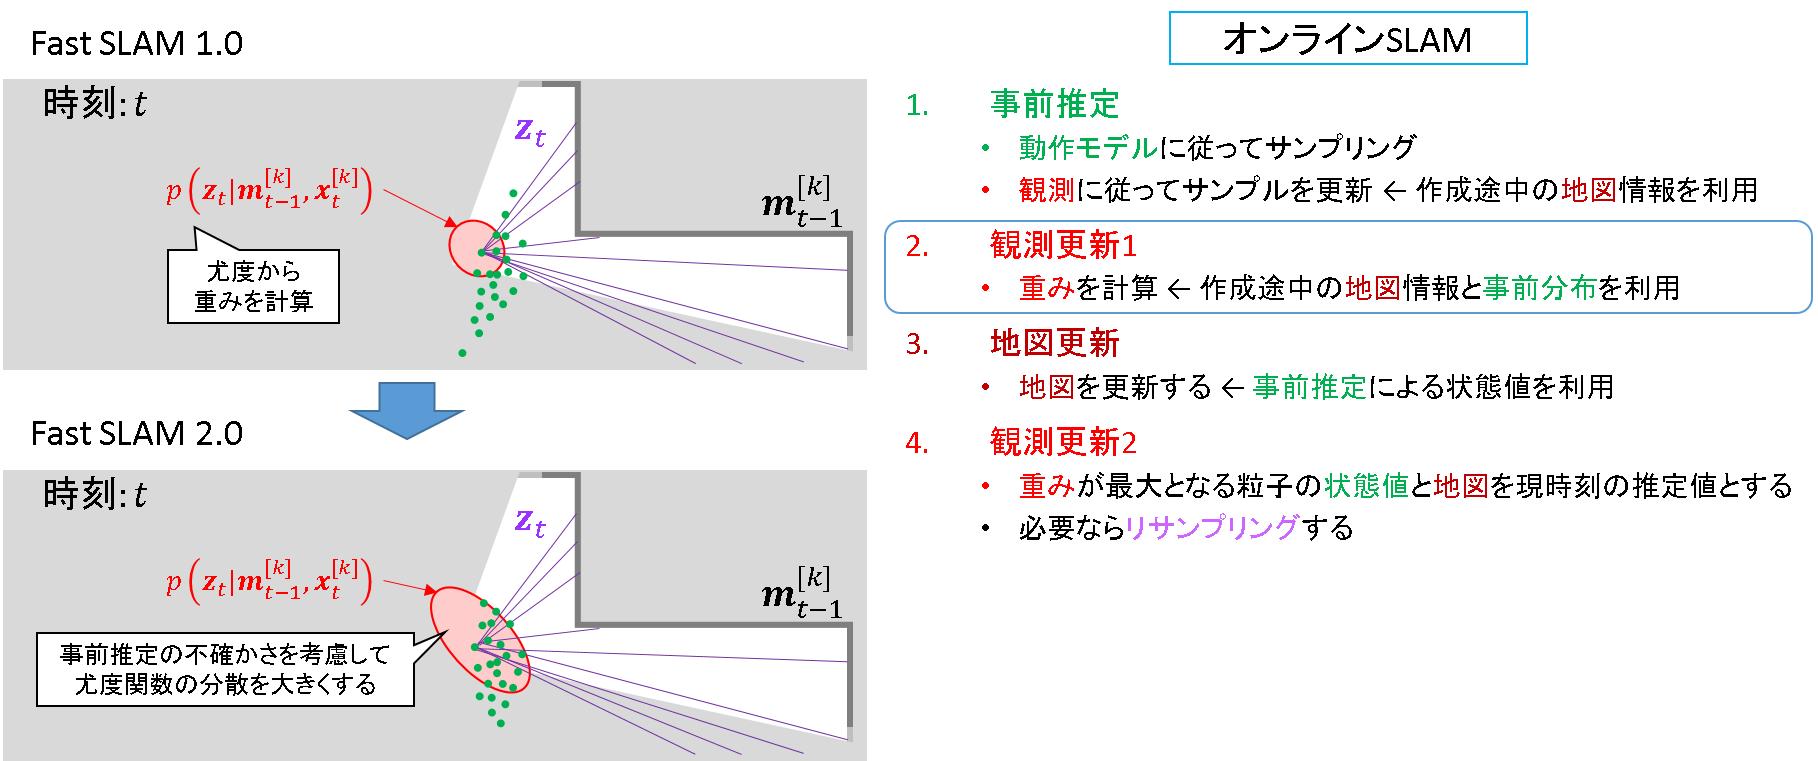 78_FastSLAM2.0_観測更新1.png